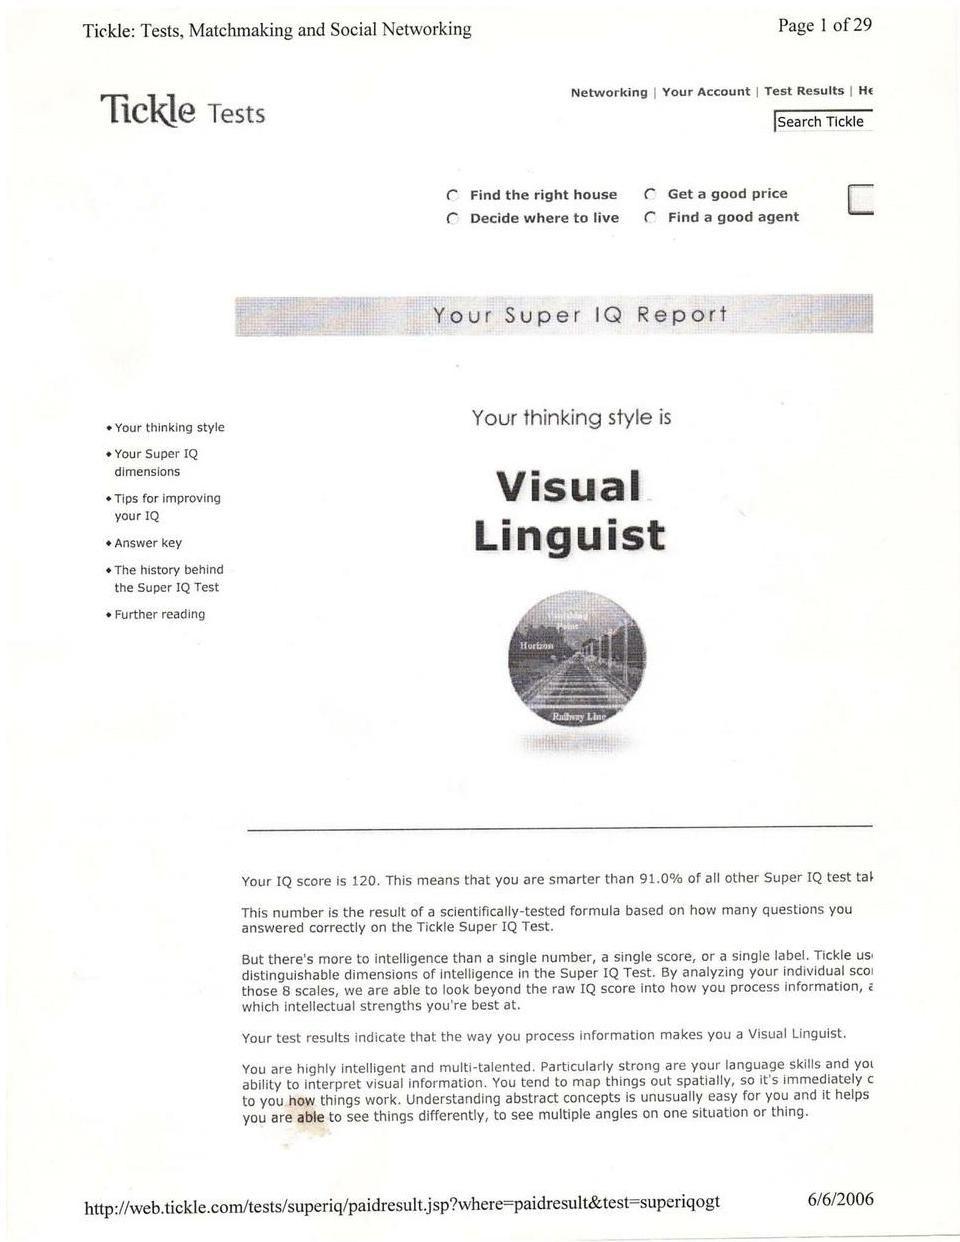 super iq test visual linguist super iq test and results made super iq test visual linguist super iq test and results made livebooklet